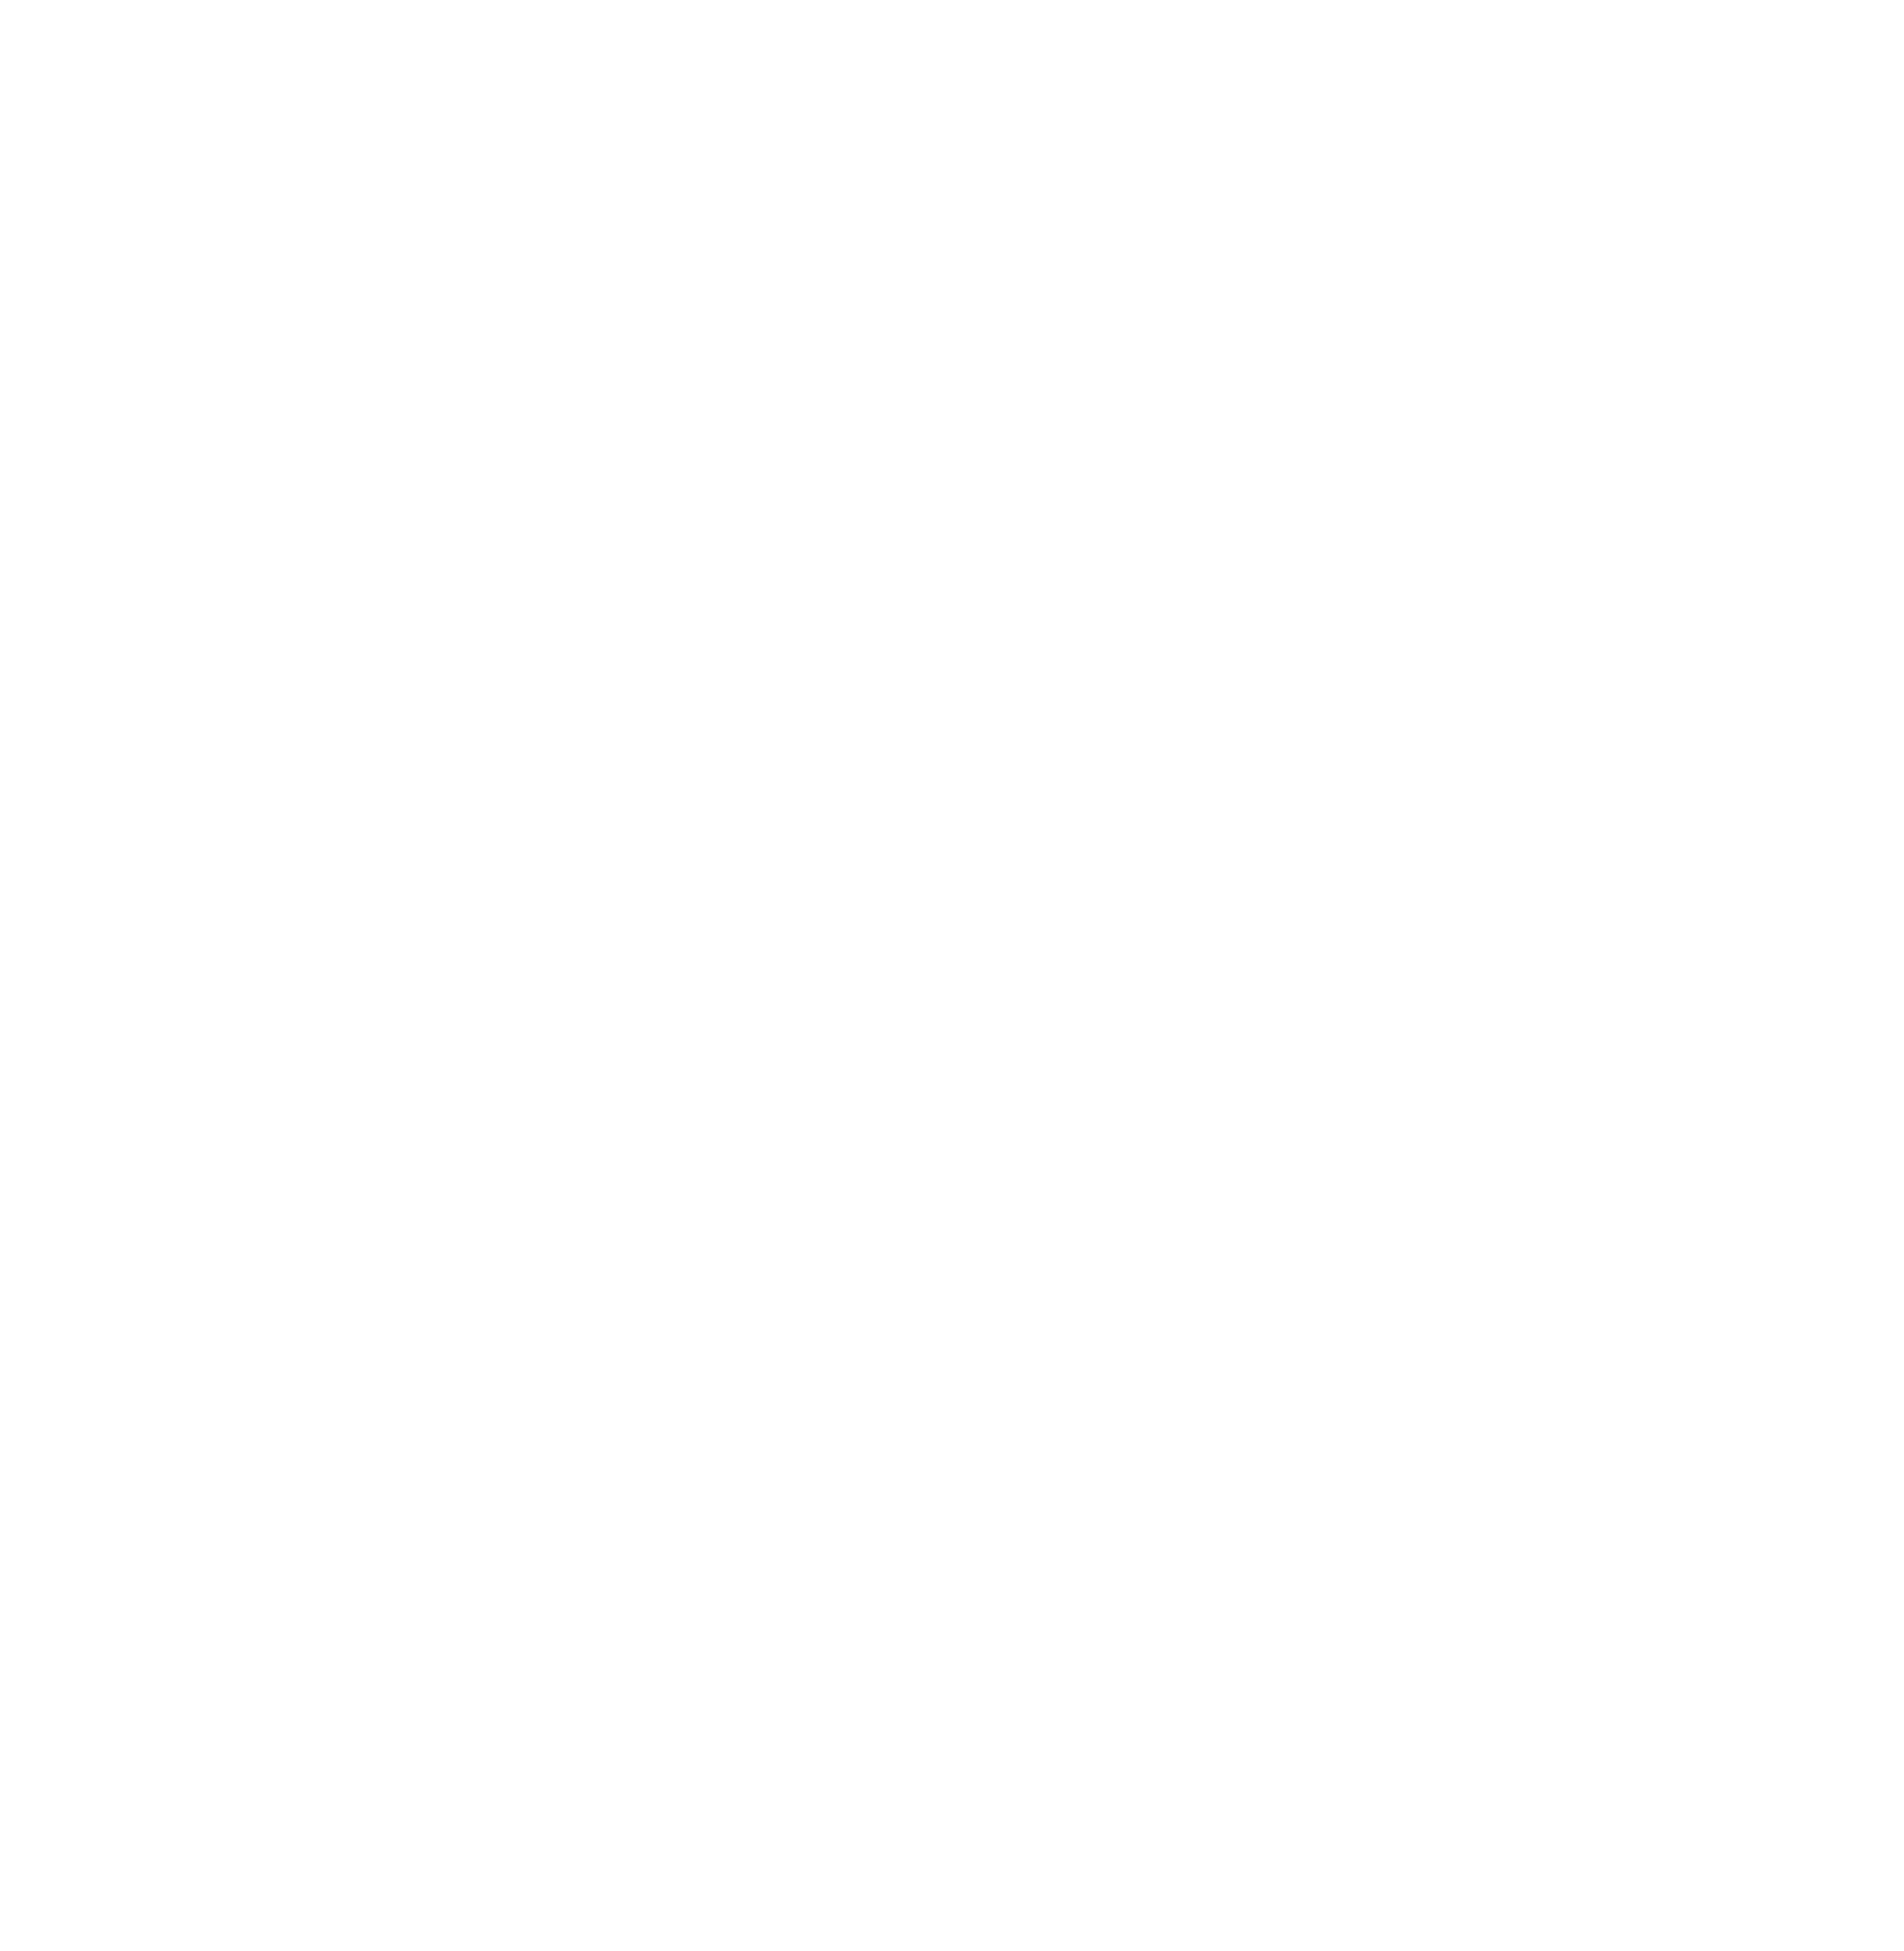 New Hope Refuge